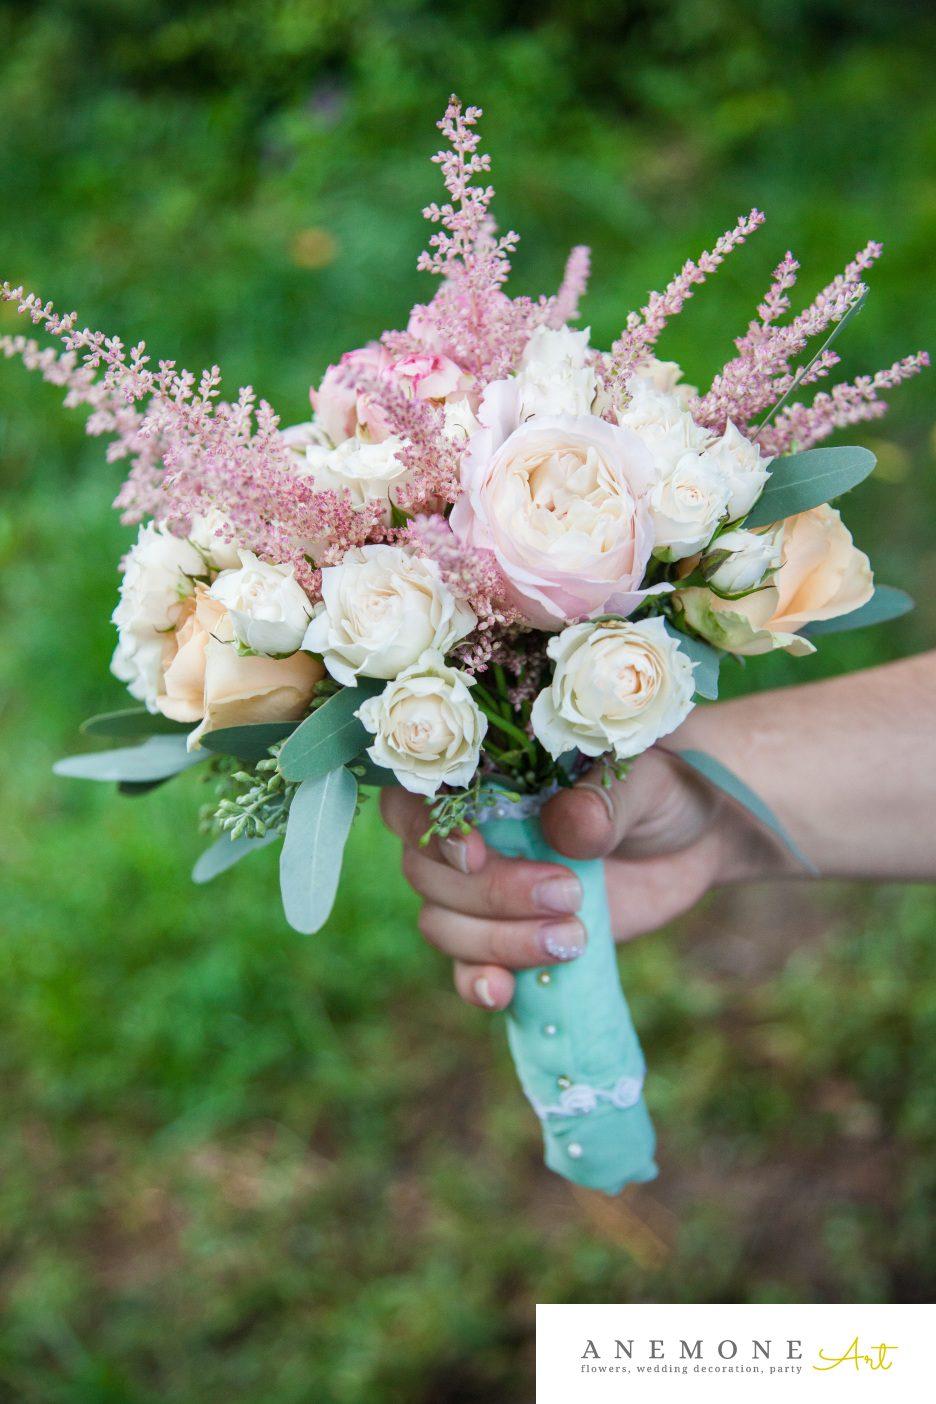 Poza, foto cu Flori de nunta buchet cununie in Arad, Timisoara, Oradea (wedding flowers, bouquets) nunta Arad